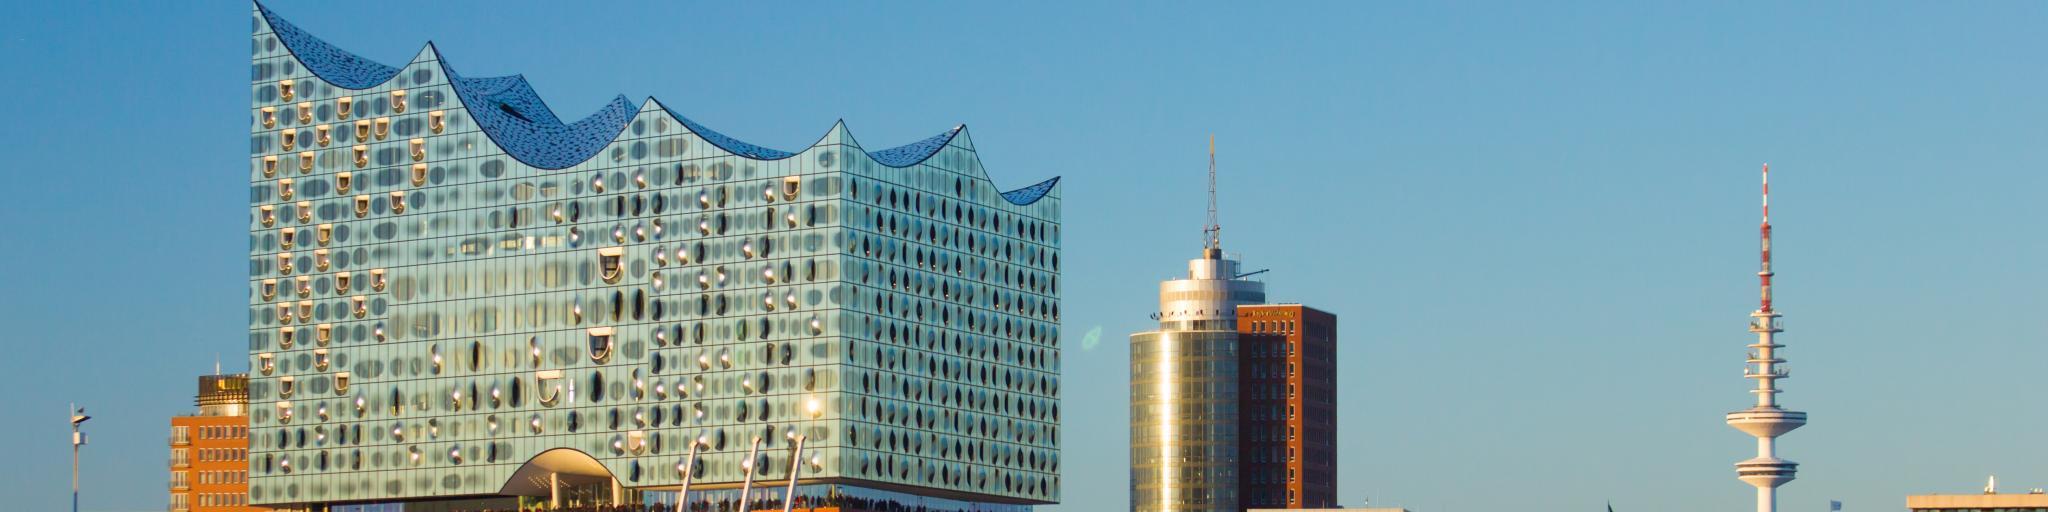 Hamburg's Elbphilharmonie opera hall glistens in the sunlight and overlooks the harbour